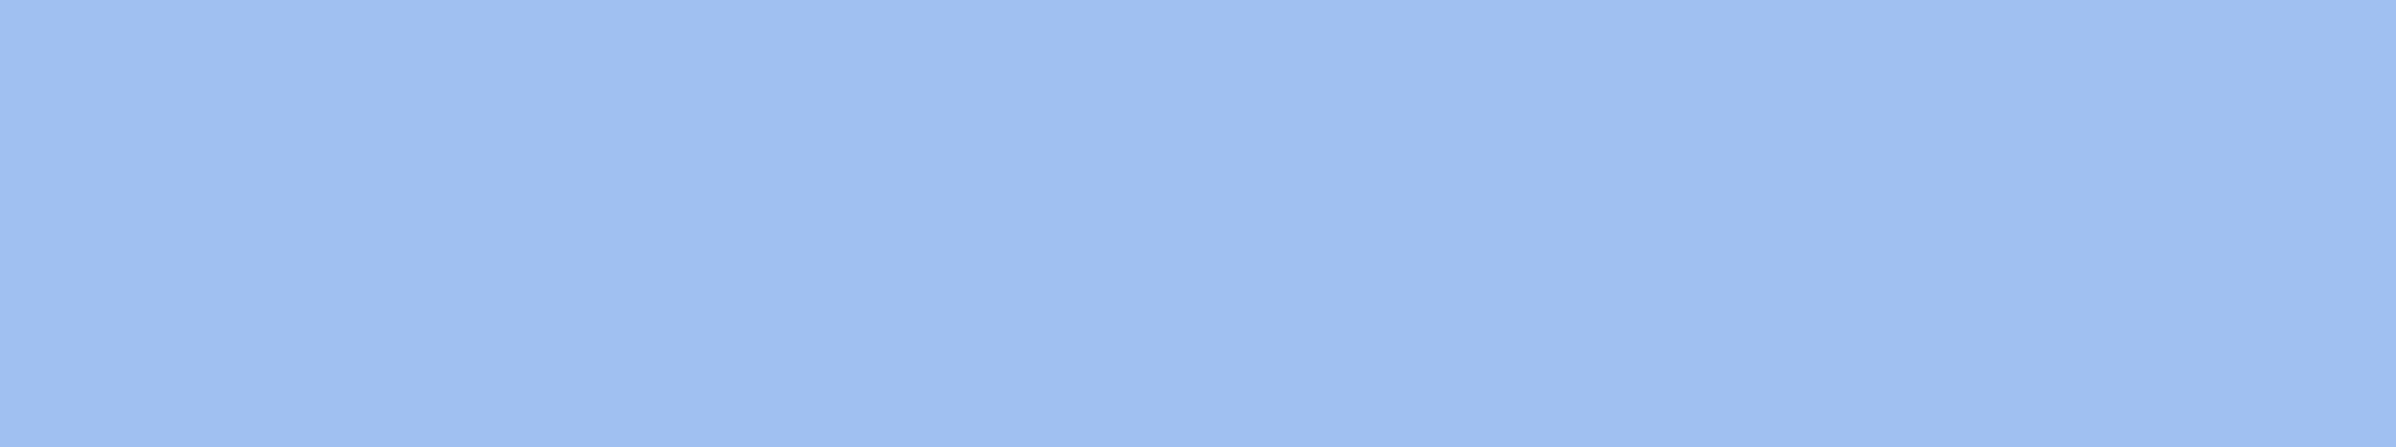 #1695 @ 1% - White